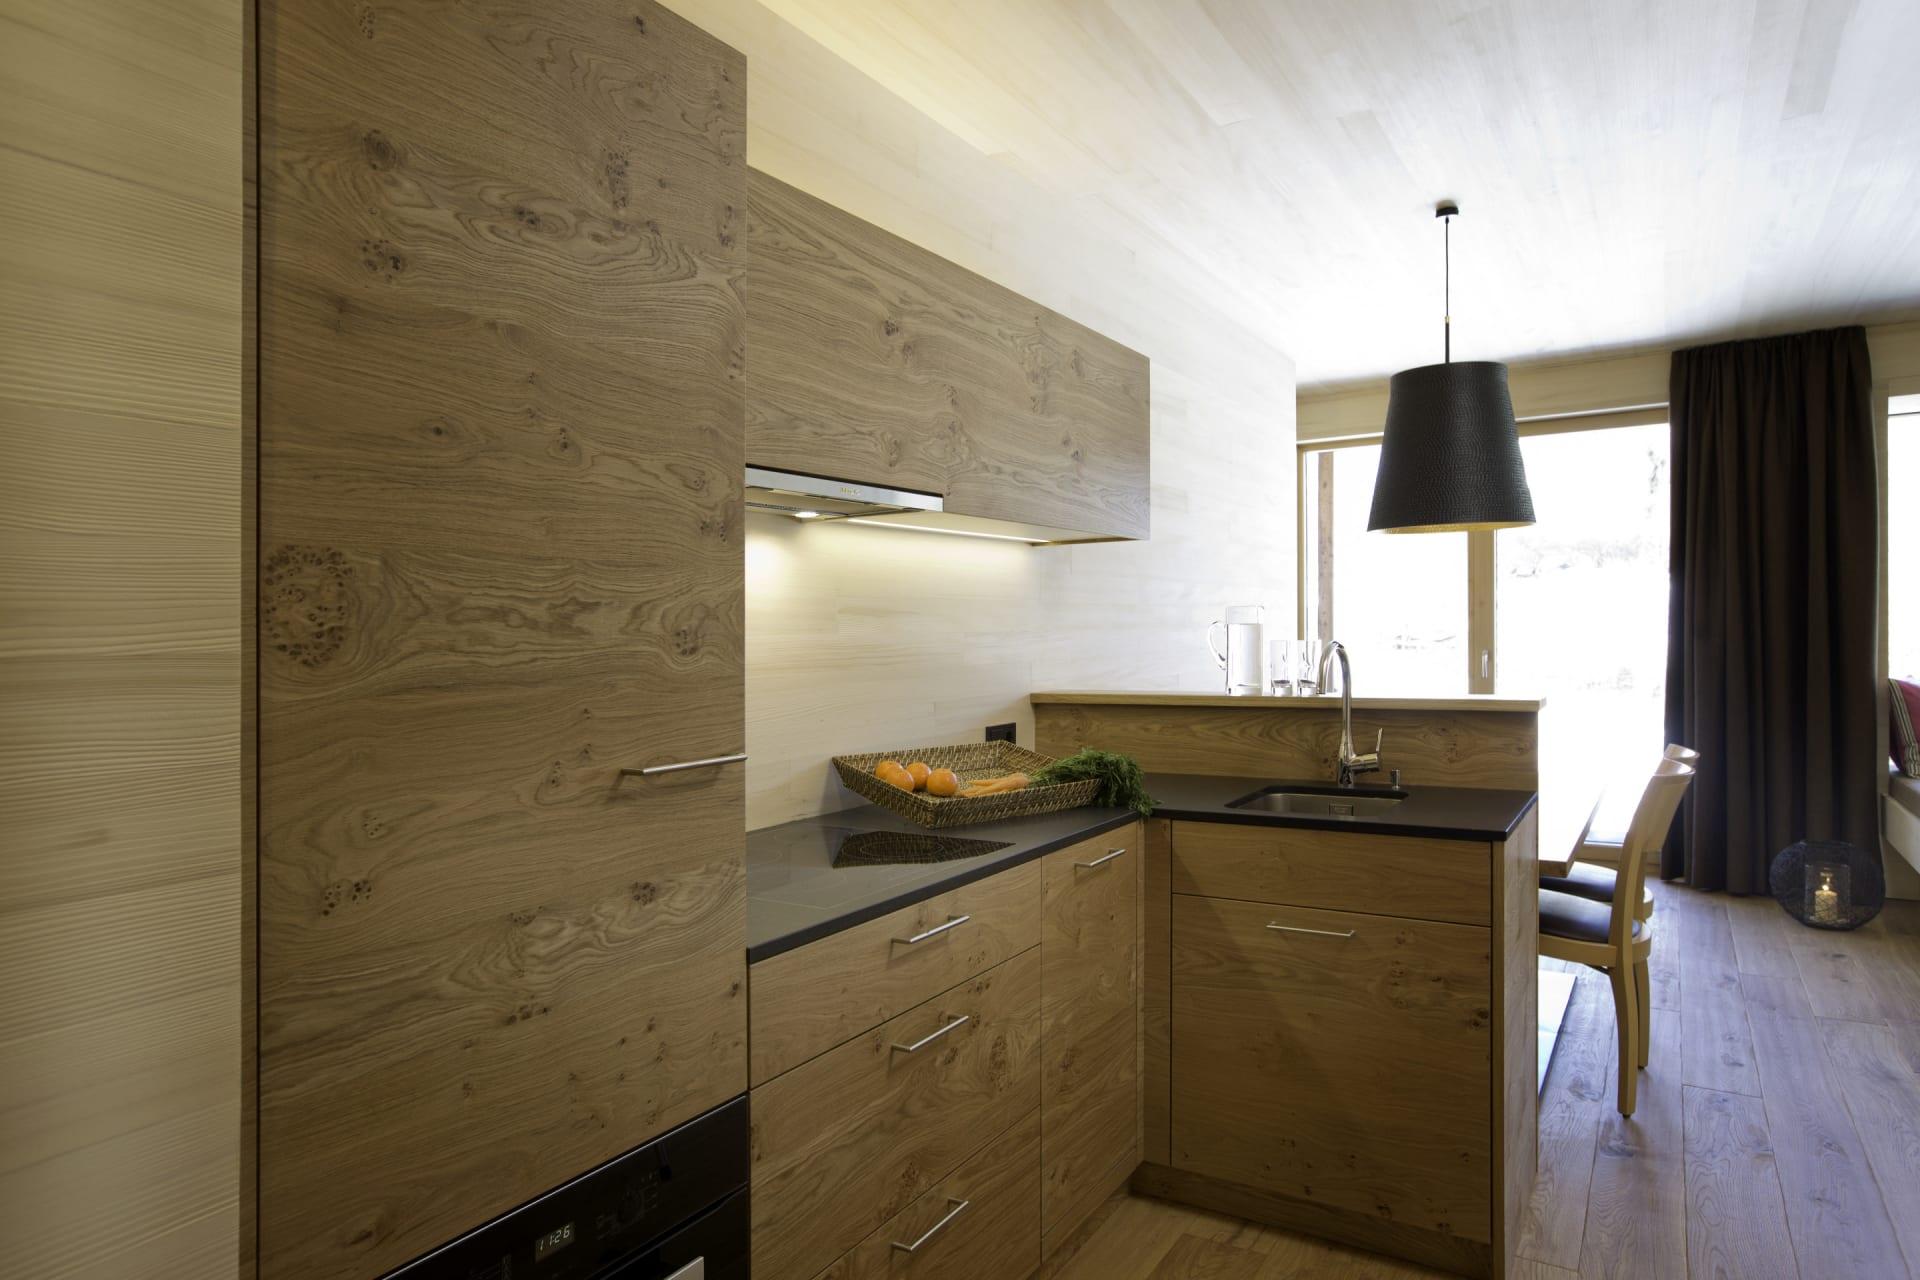 n 05 Apartment 2-5 Personen